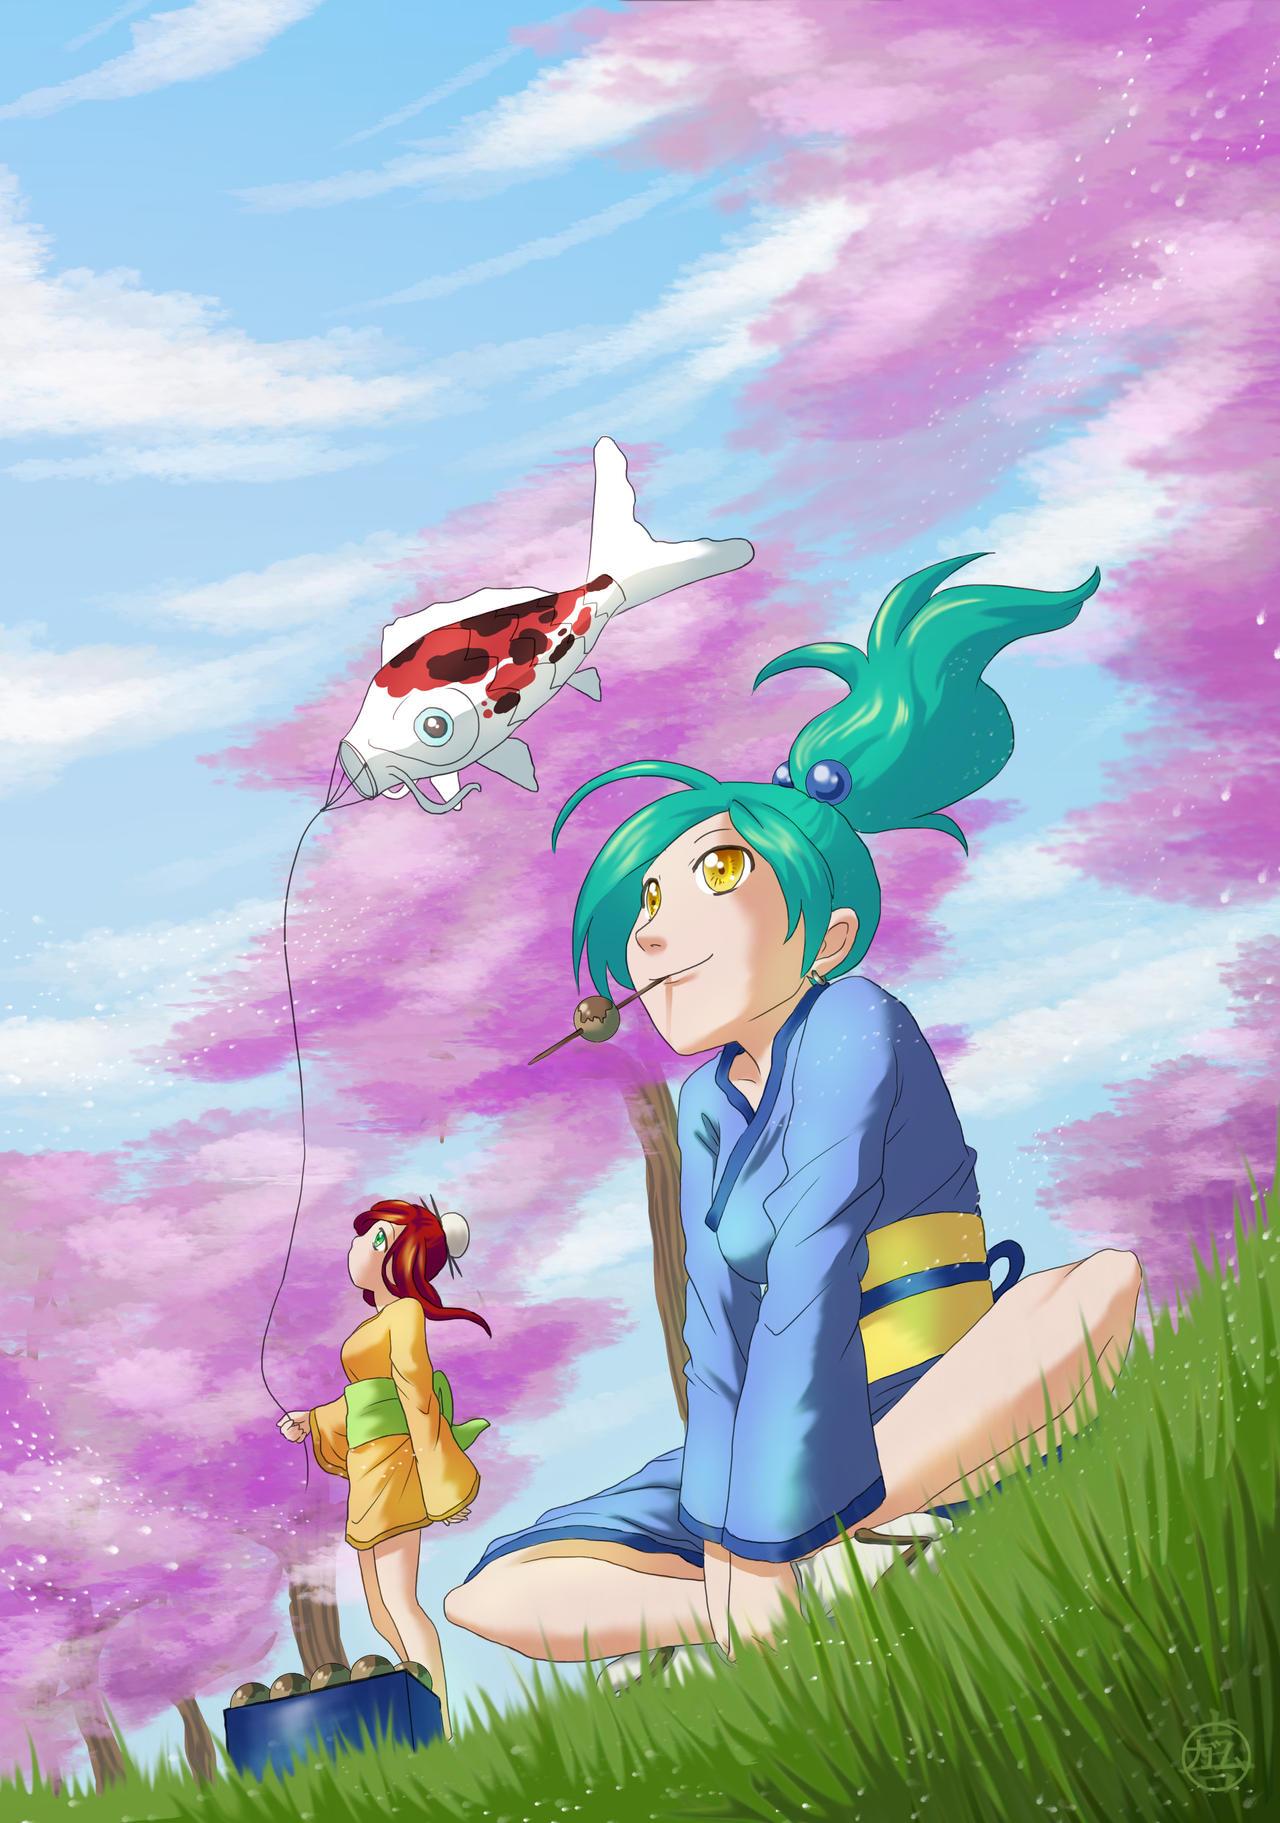 Blossom by GaMu-ChAn